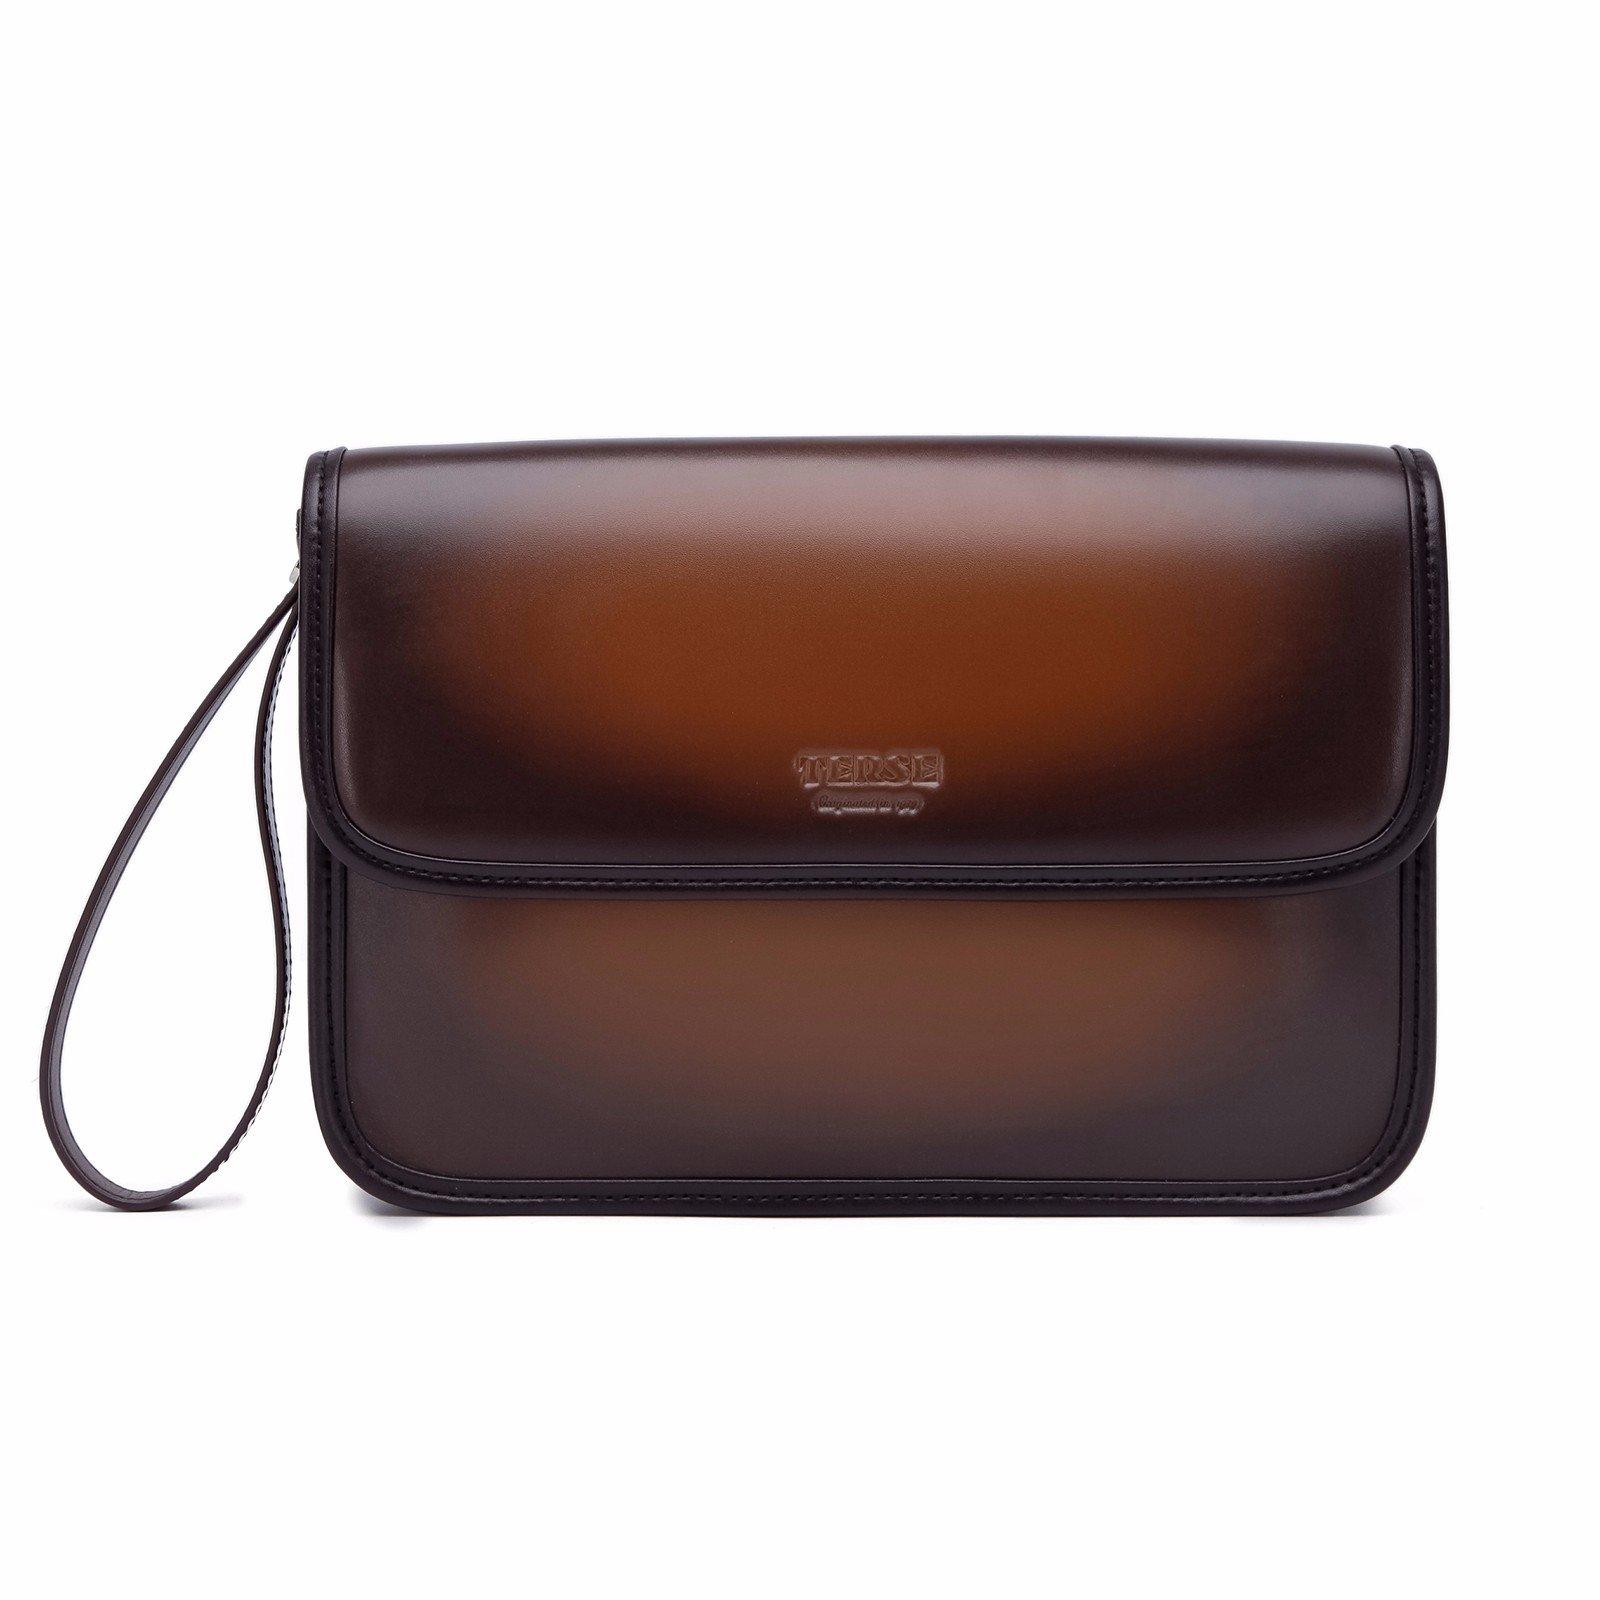 TERSE Genuine Leather Clutch Bag Handmade Wristlet Card Cash Holder Business Handbag Zipper Wallets Manual Brush-off(Tobacco) TS615Q